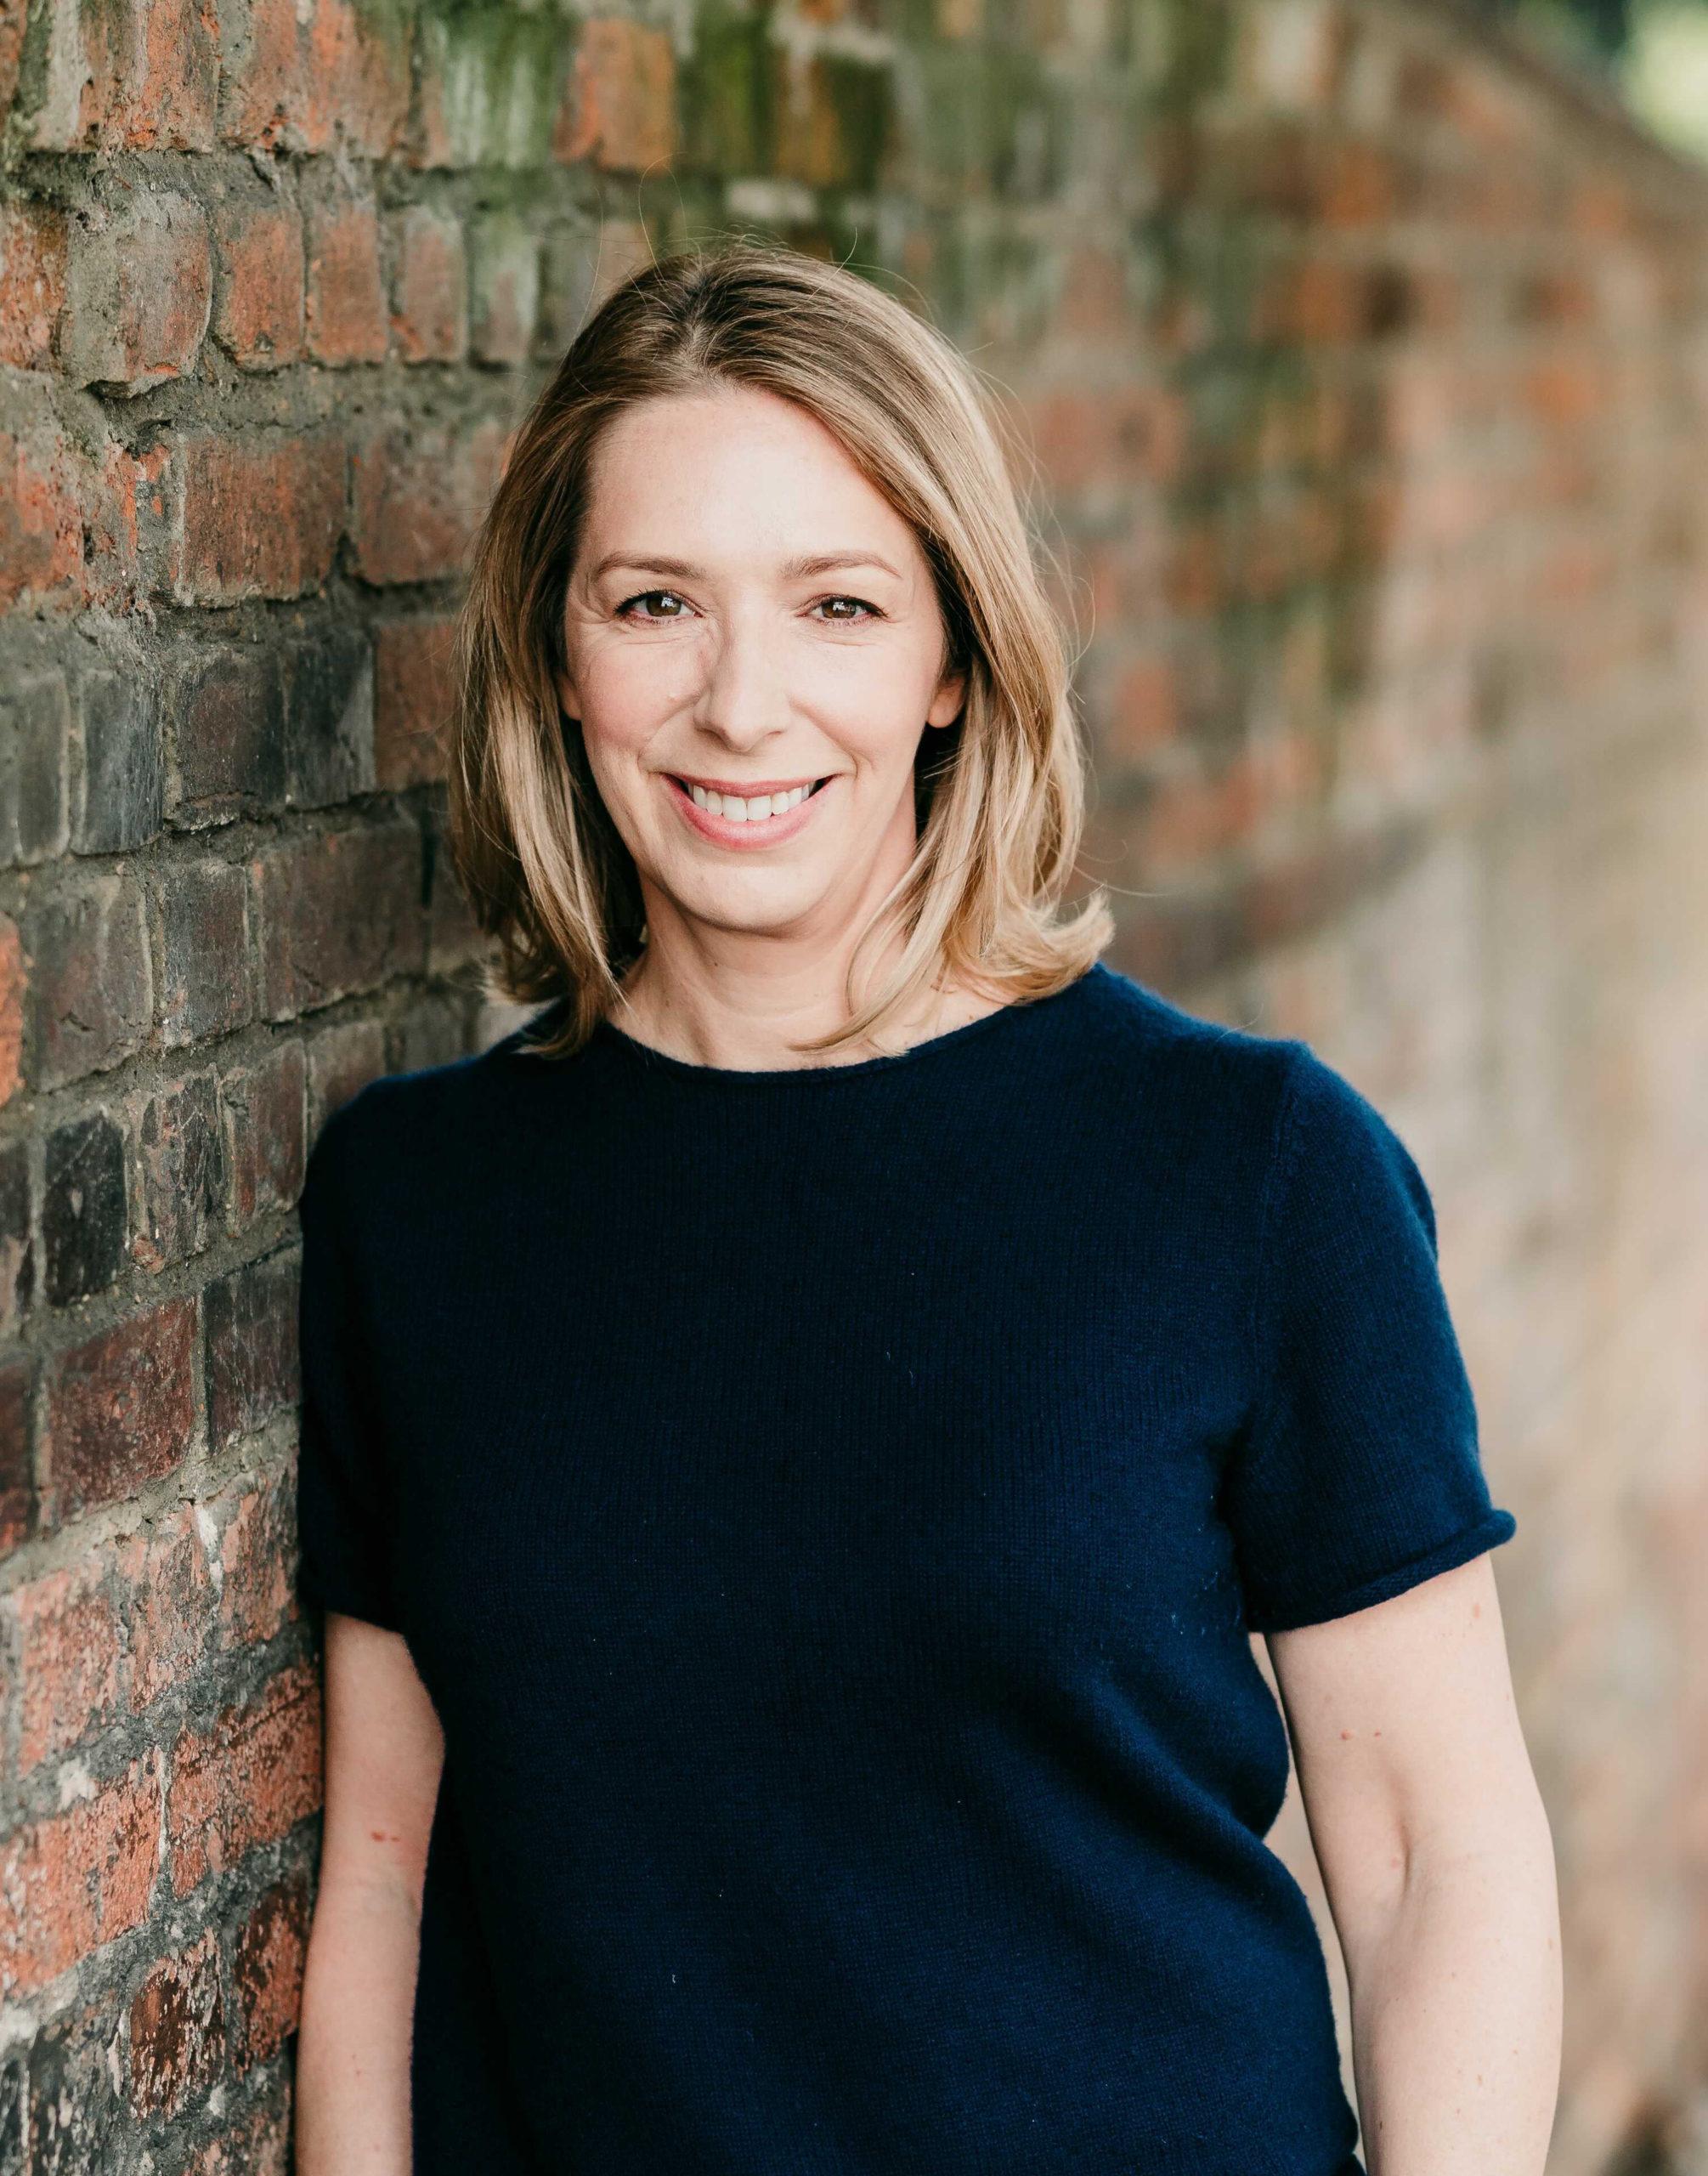 Karen, Digital Marketing Powerhouse and audiobook lover